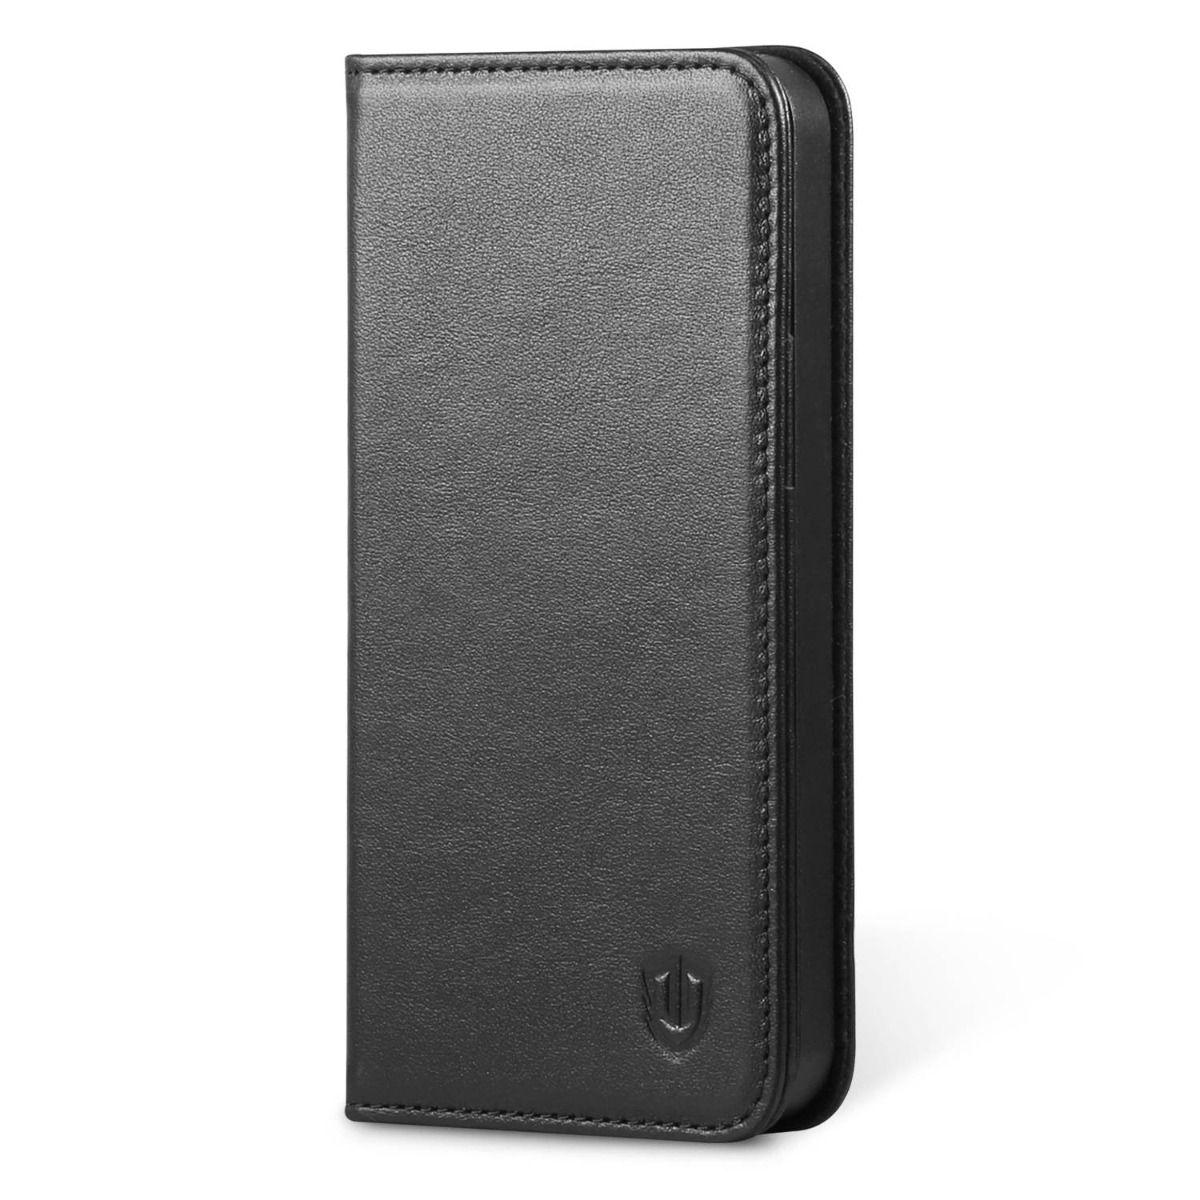 buy online 47976 9baf6 SHIELDON iPhone SE Case - Genuine Leather Wallet Case, iPhone 5 5s SE Folio  Case Cover